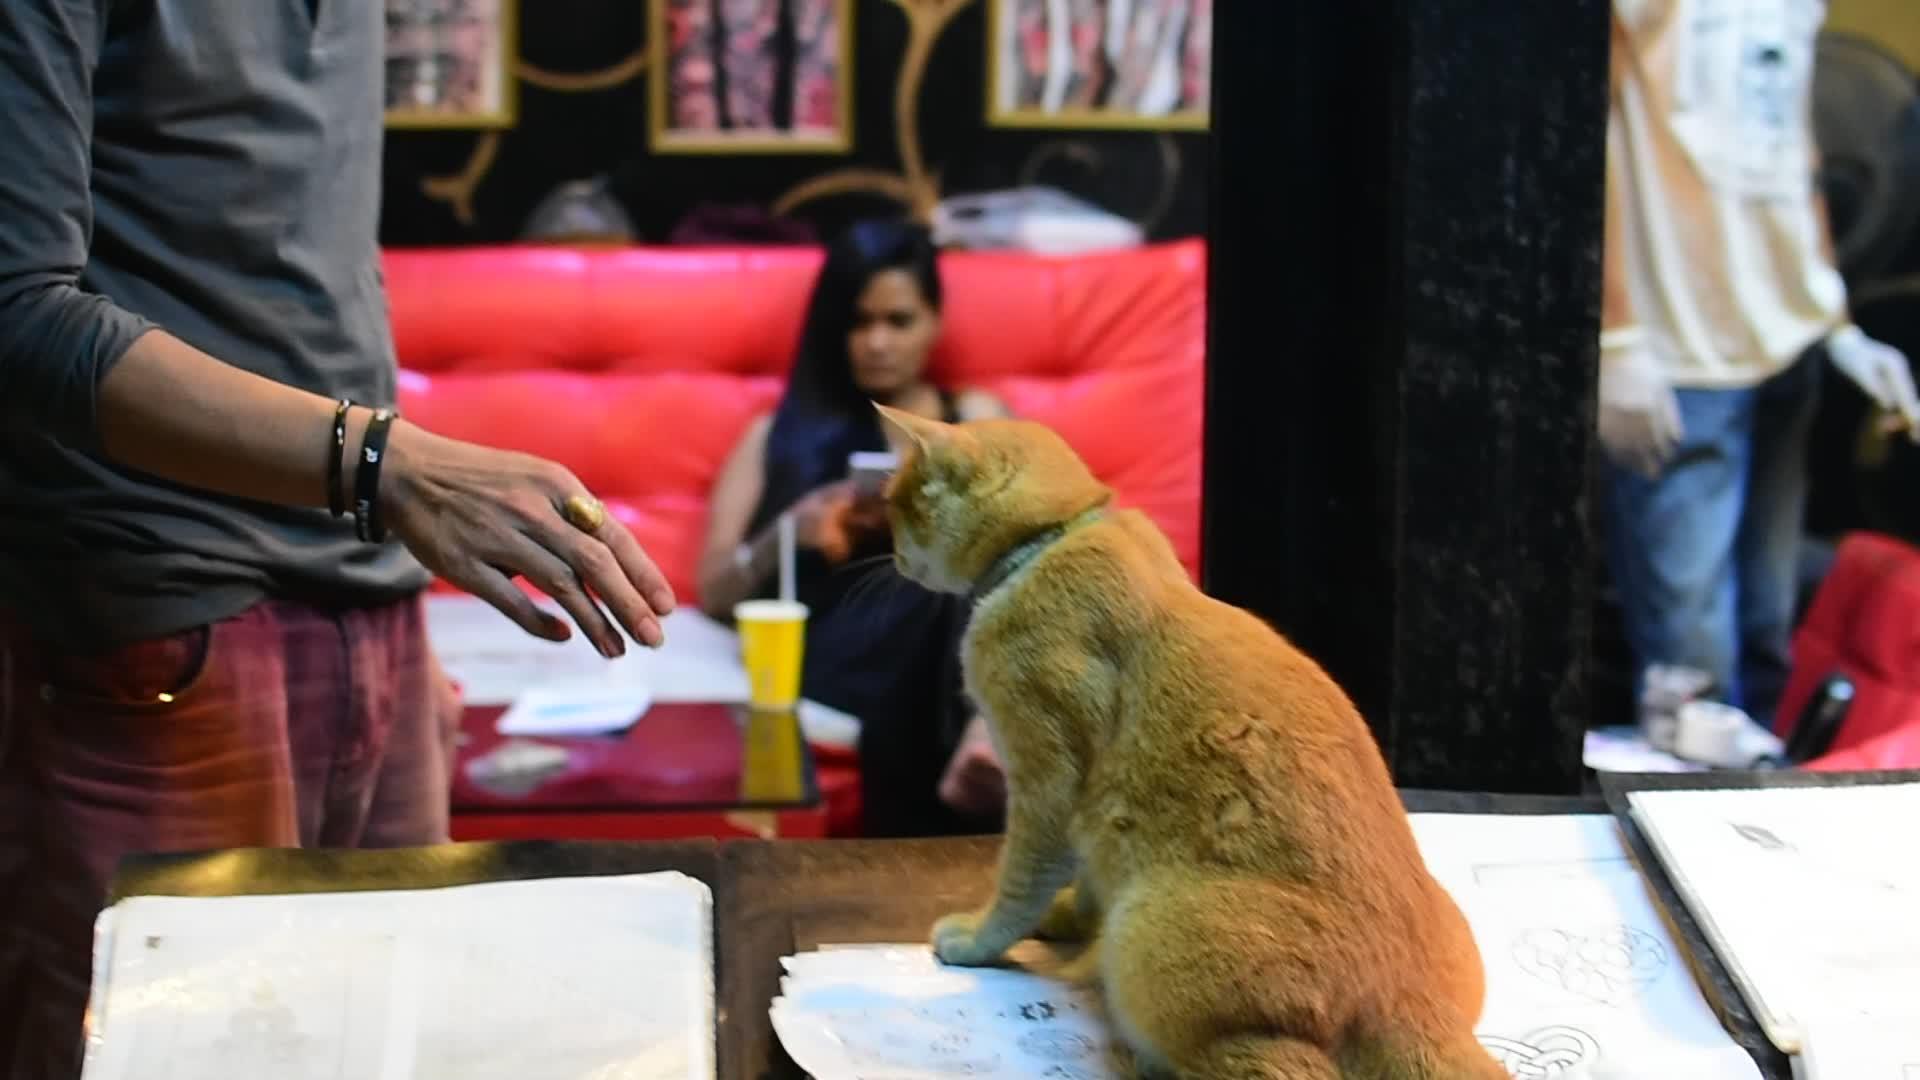 60fpsgfy, CatSlaps, catgifs, Cat Slapping hand GIFs